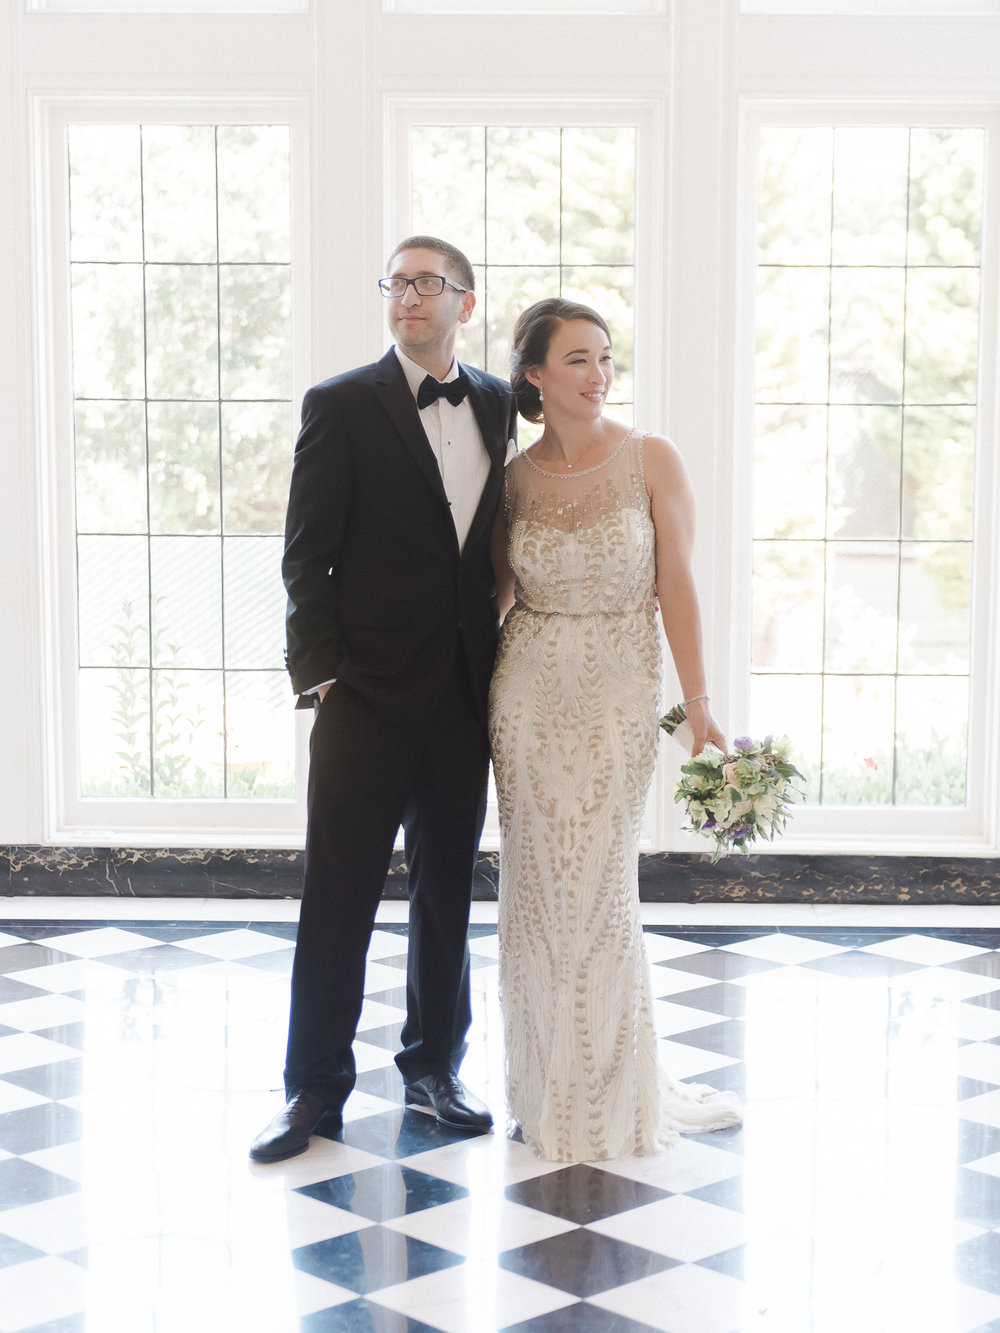 Sarah+Warren_wedding_spp-49.jpg